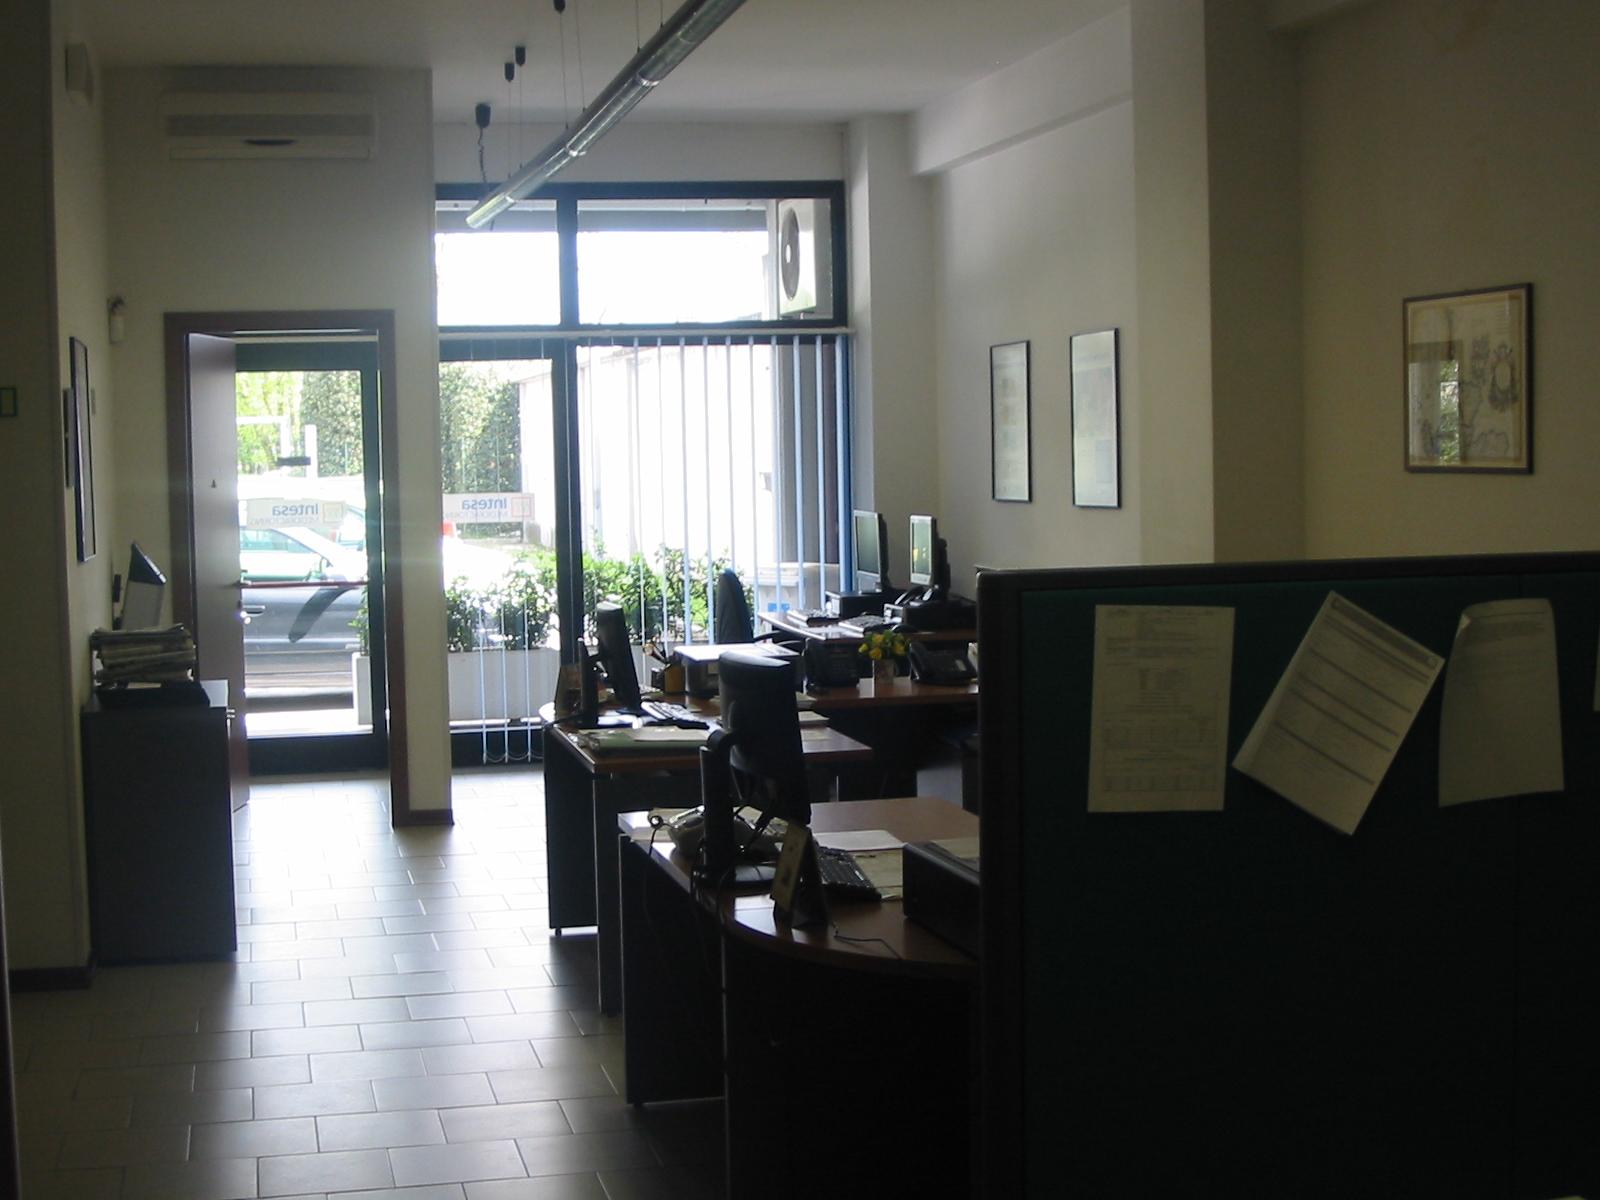 Affitto uffici a fabriano ancona for Affitto uffici bufalotta